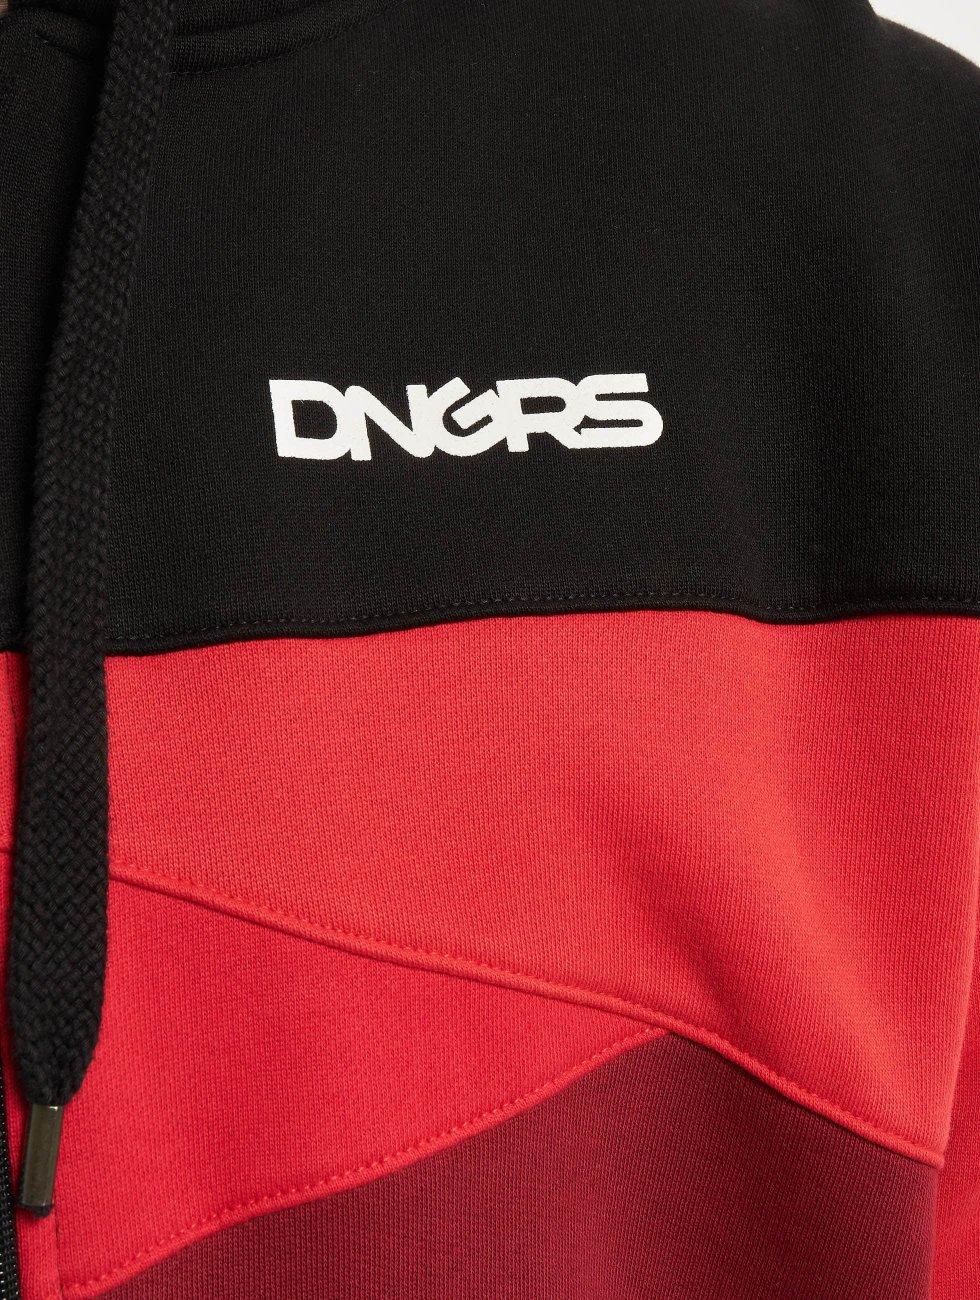 Dangerous DNGRS Zip Hoodie Limited Edition II Race City black